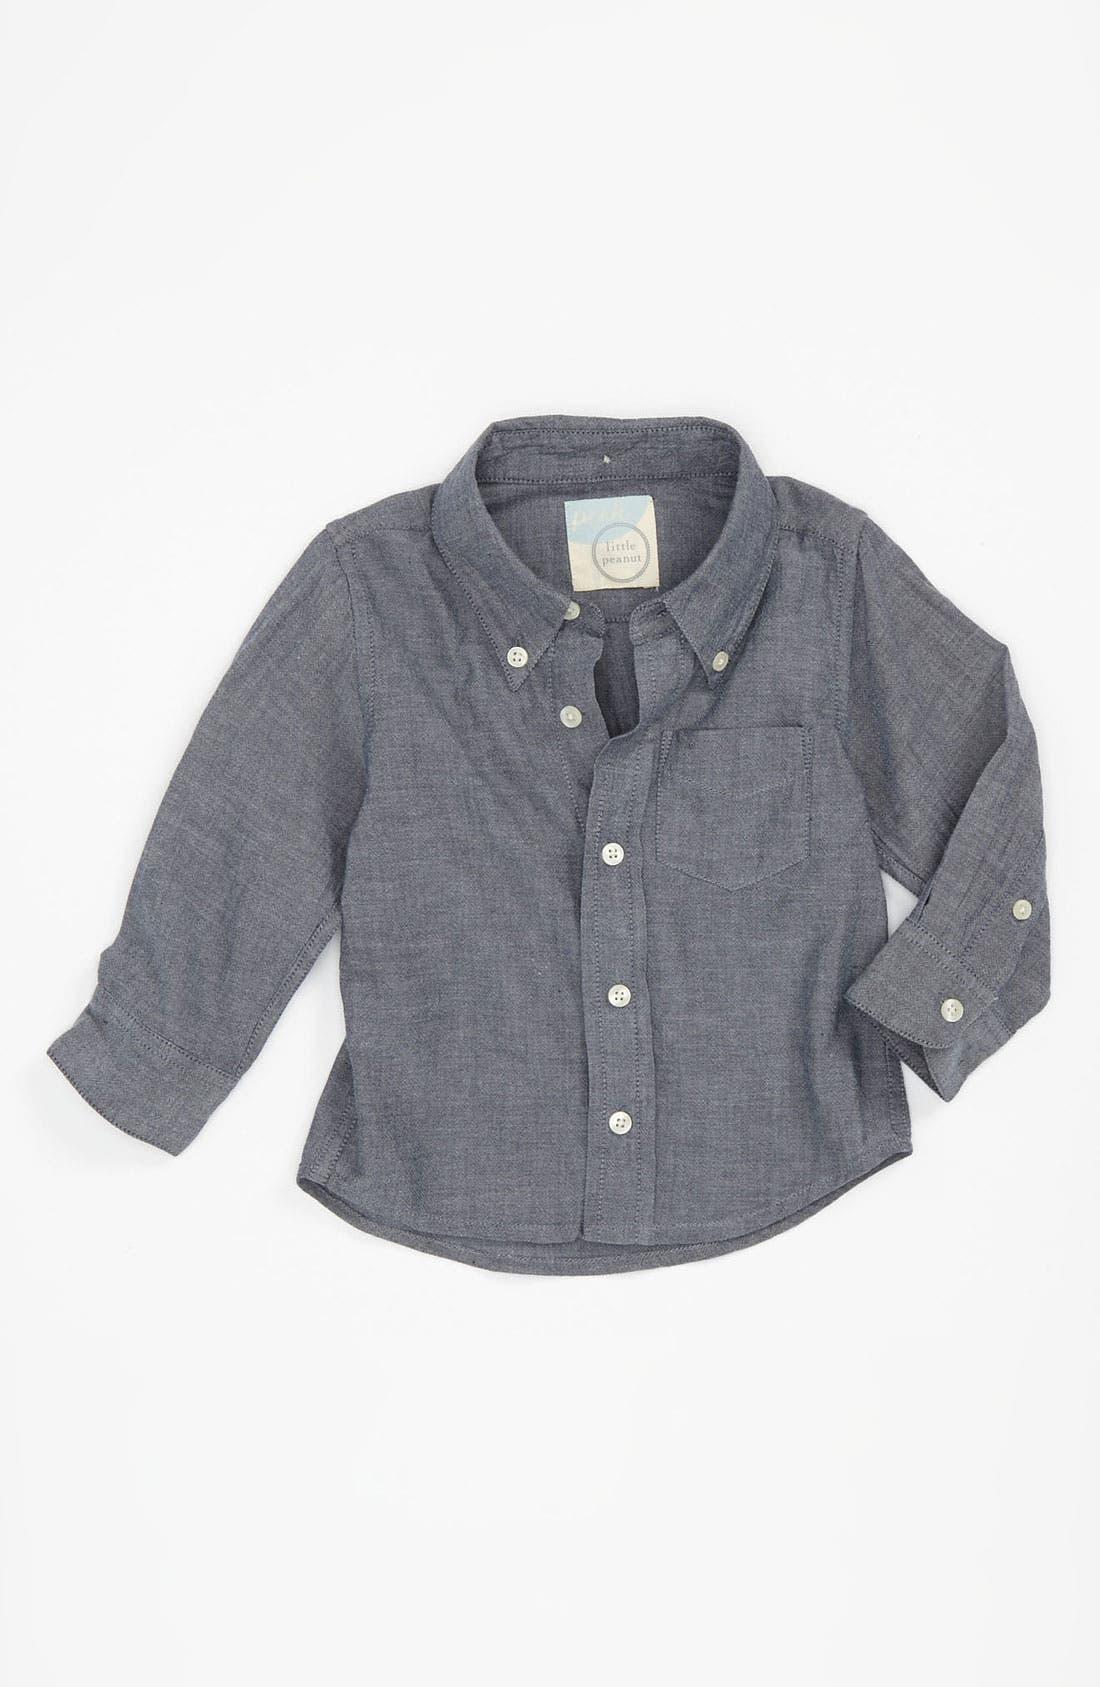 Main Image - Peek 'Clifton' Chambray Shirt (Infant)